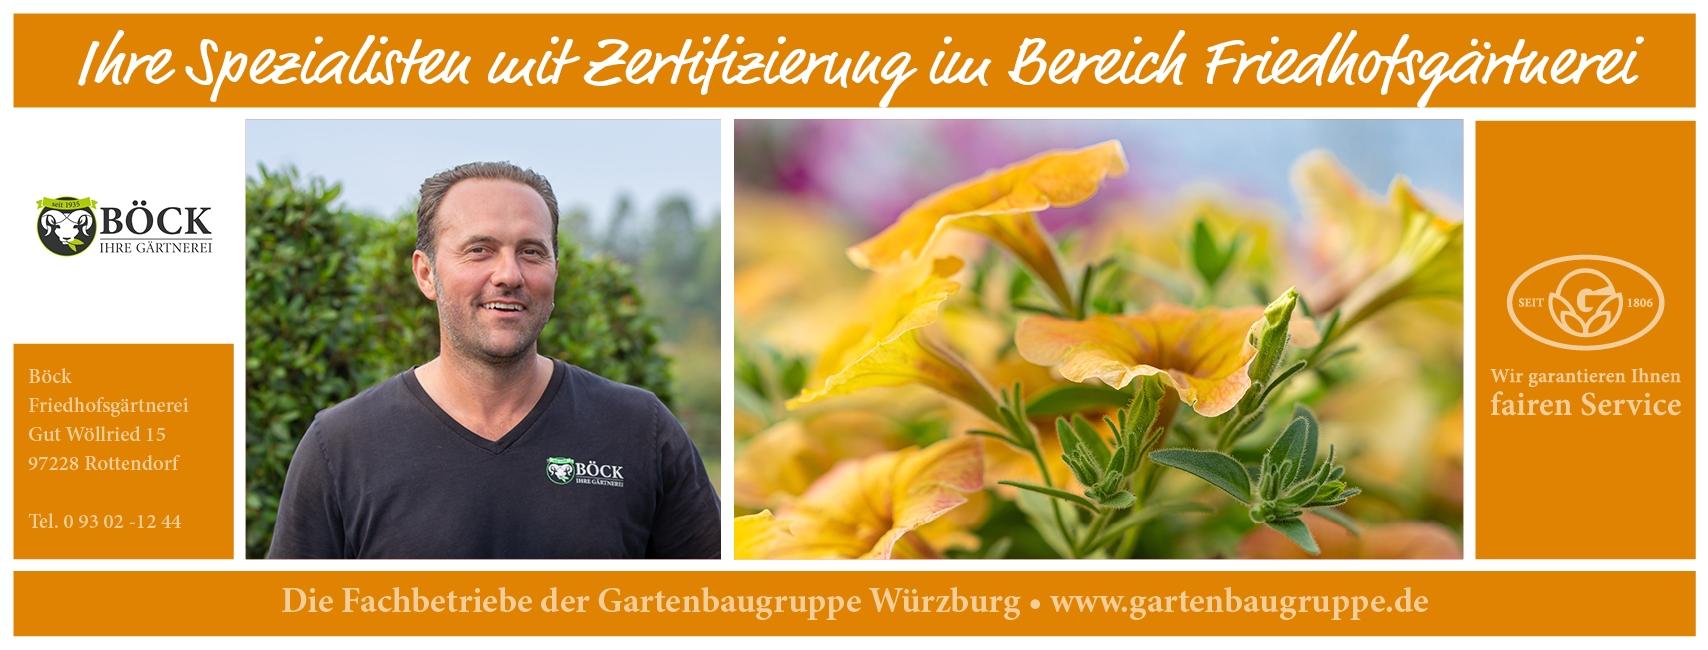 Gärtnerei Böck - Gartenbaugruppe Würzburg